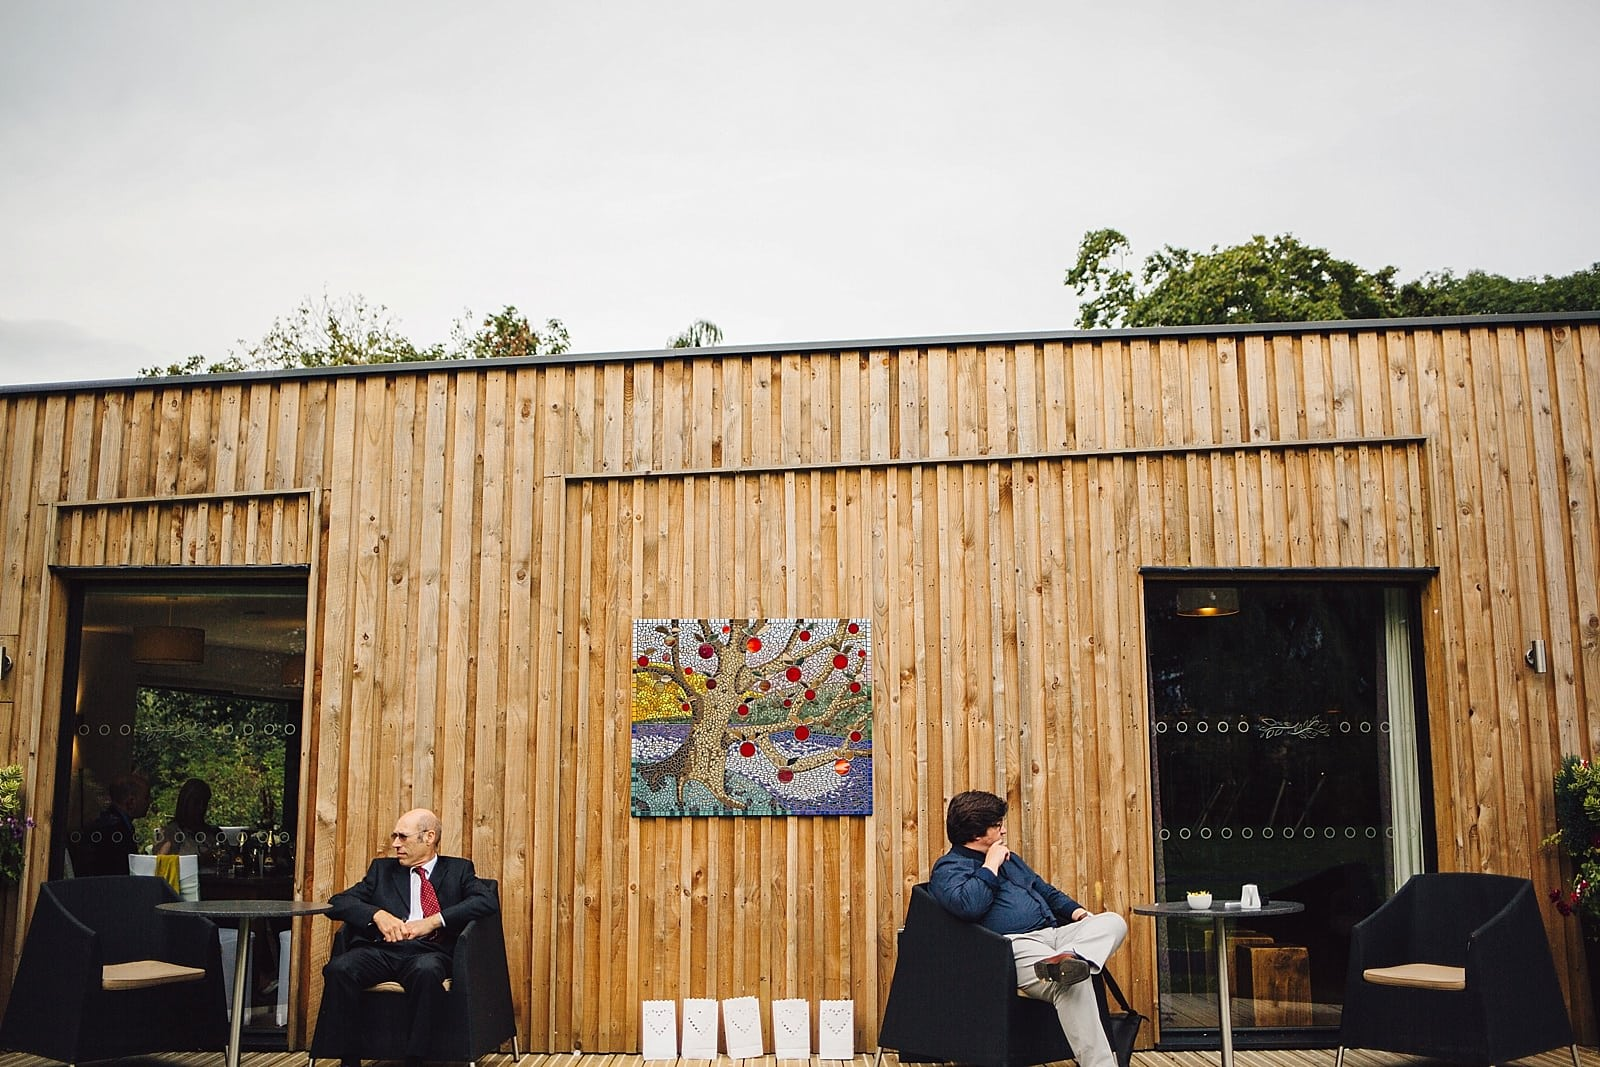 hothorpe-hall-woodlands-wedding-photography_0047